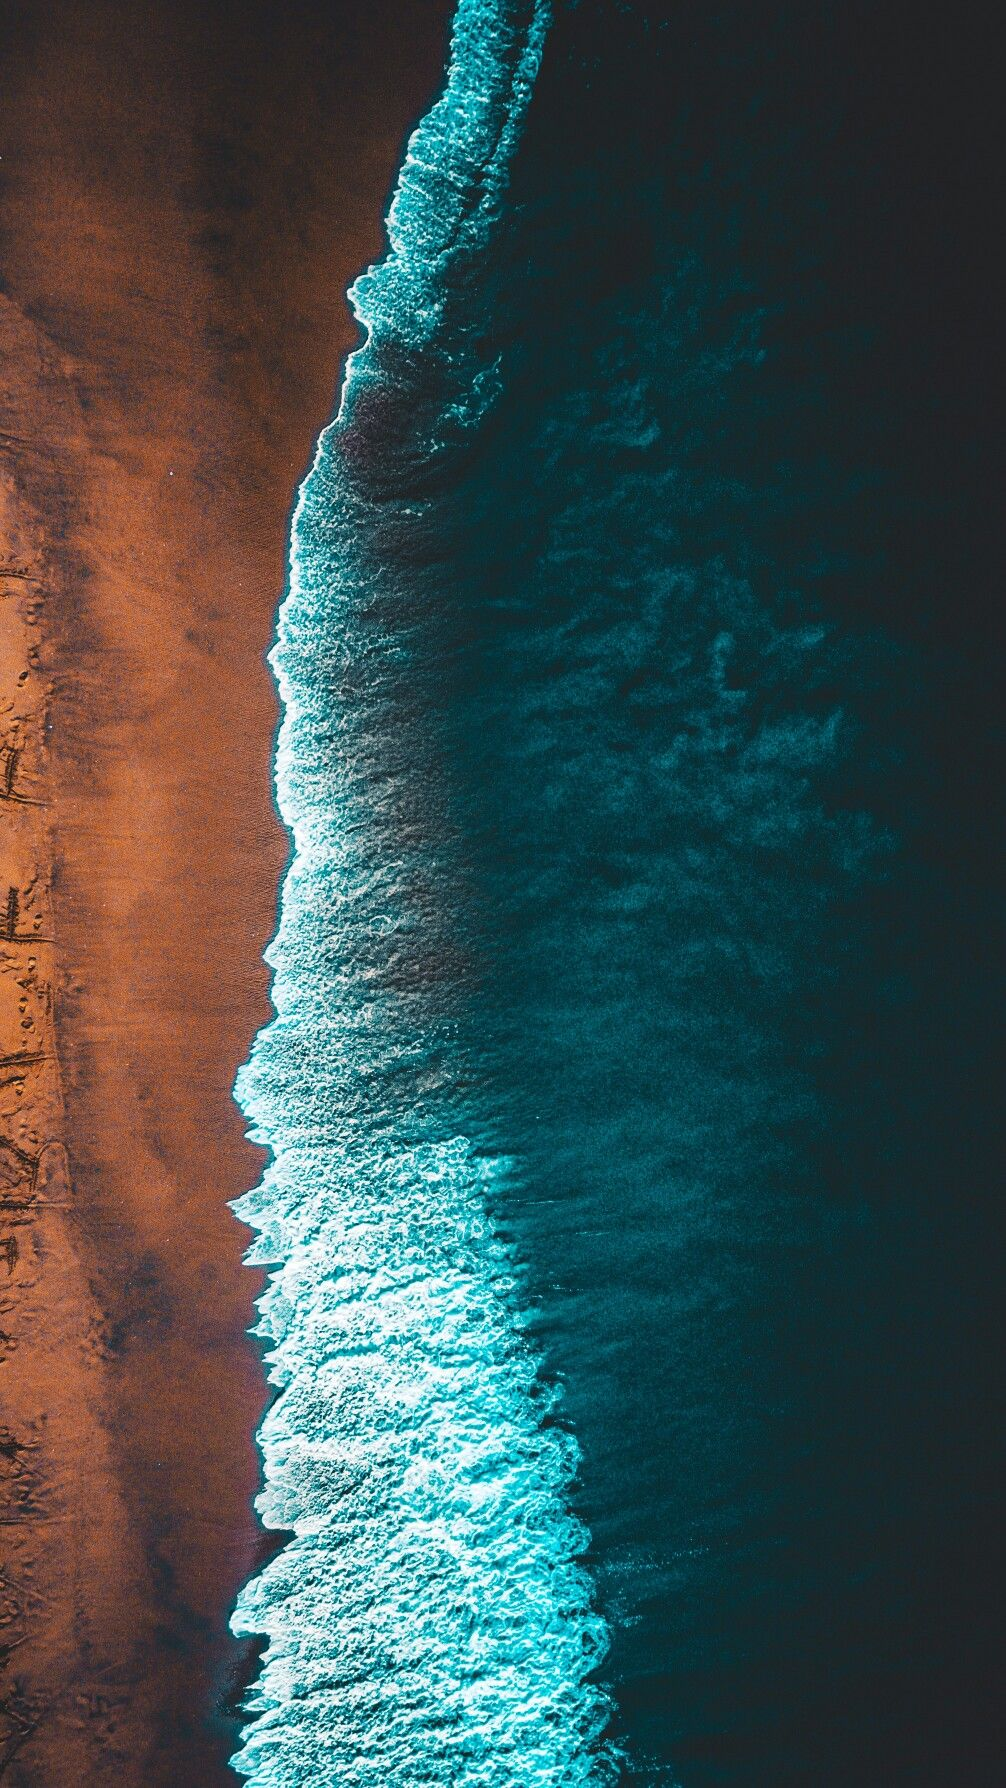 Pin By Megan Jo On Drones Photography Nature Wallpaper Ocean Wallpaper Wallpaper Iphone Ios7